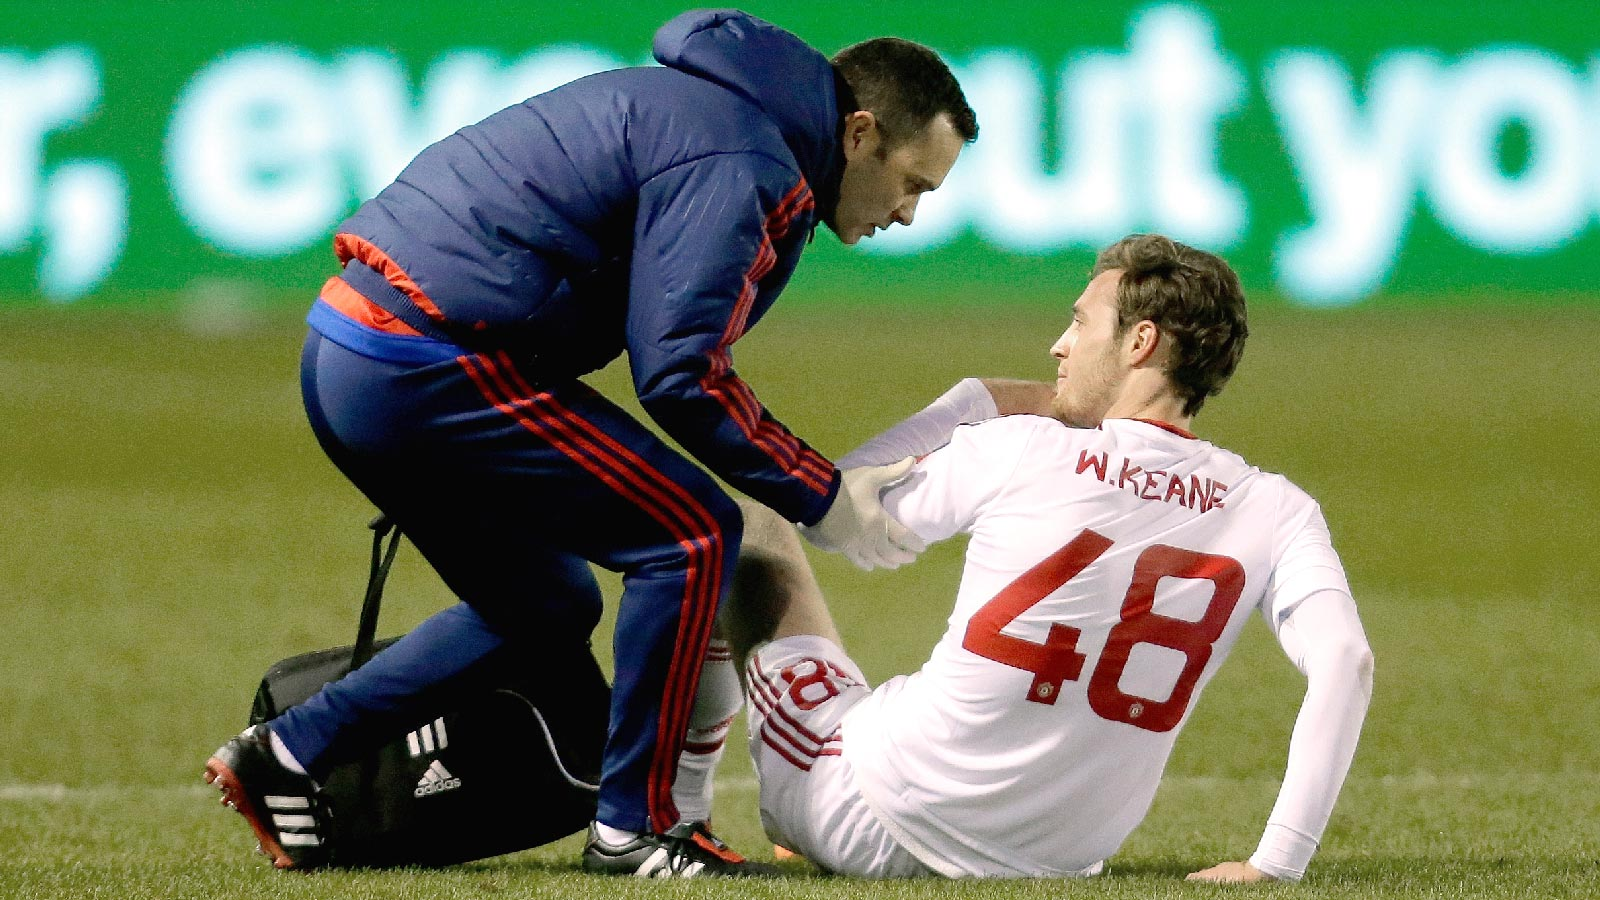 Man United's injury crisis grows after Shrewsbury win